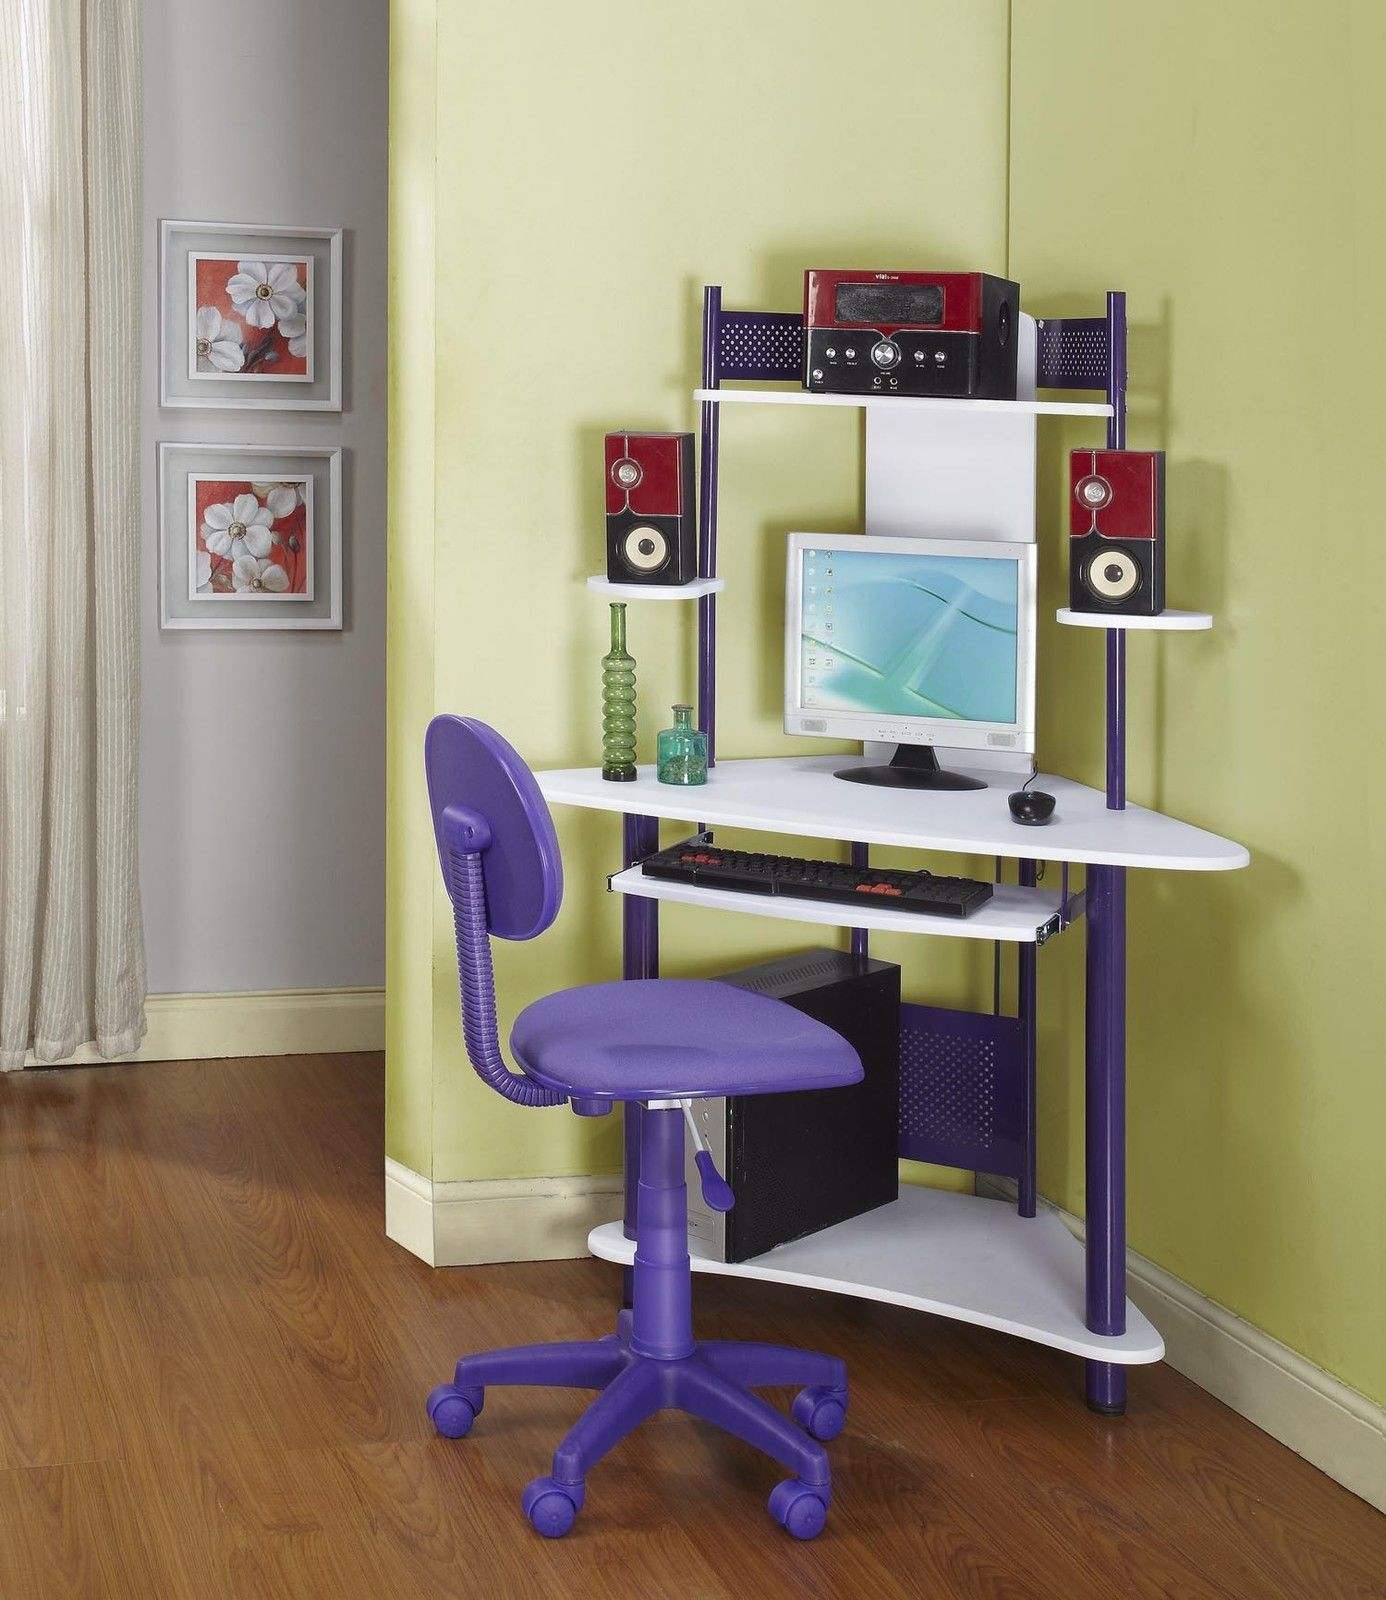 50 computer desk for small spaces up to 70 off visual hunt rh visualhunt com home computer desk ikea home computer desktop